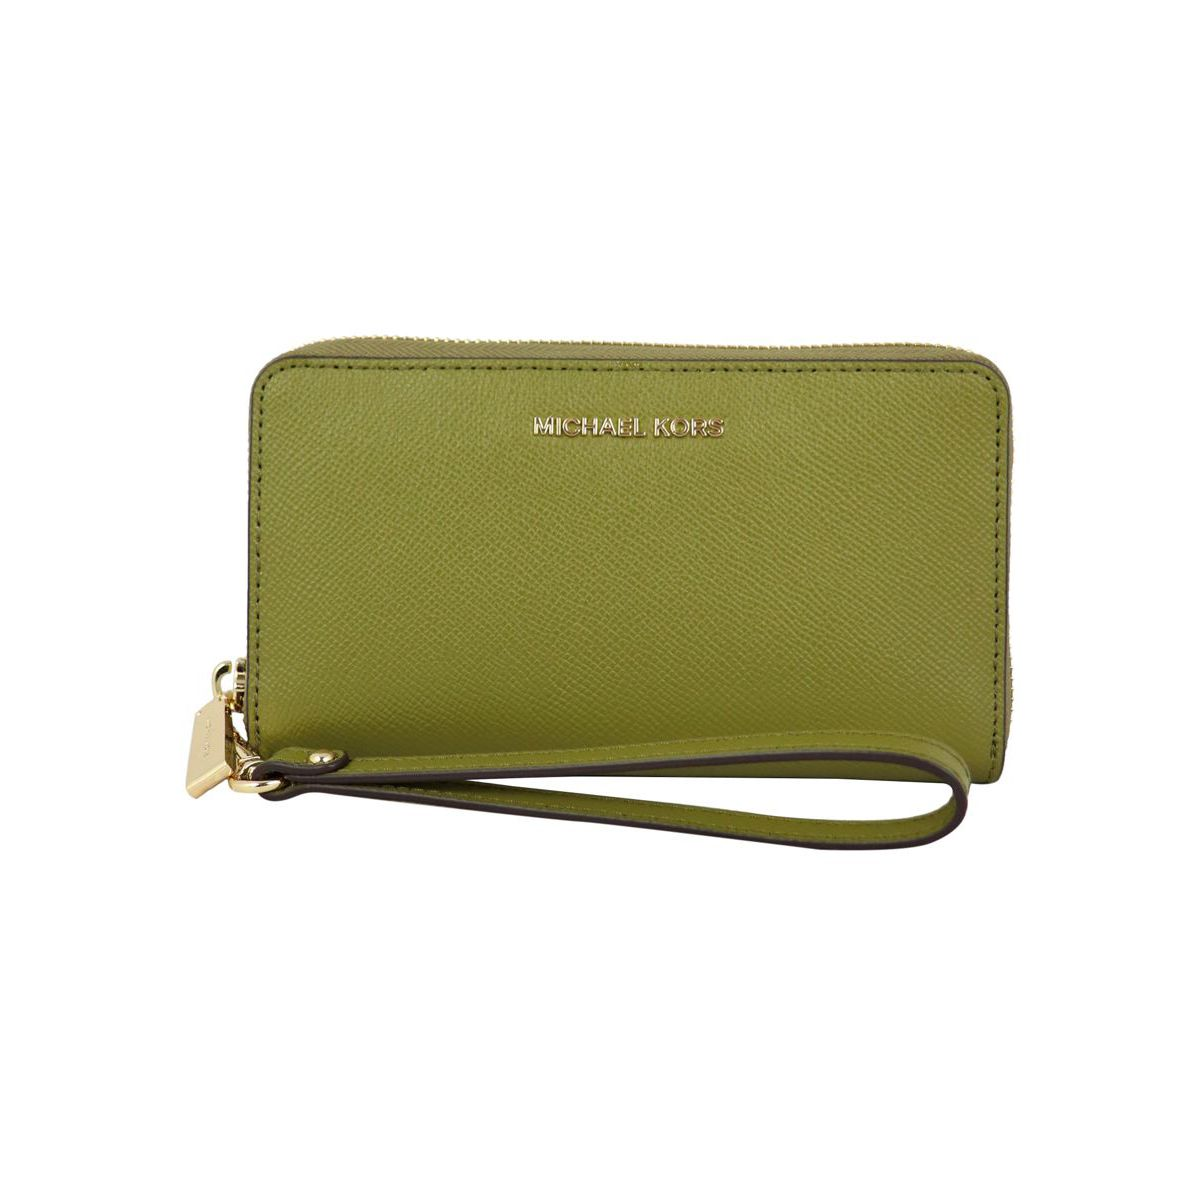 Jet Set wallet with cell phone pocket Pistachio Michael Kors